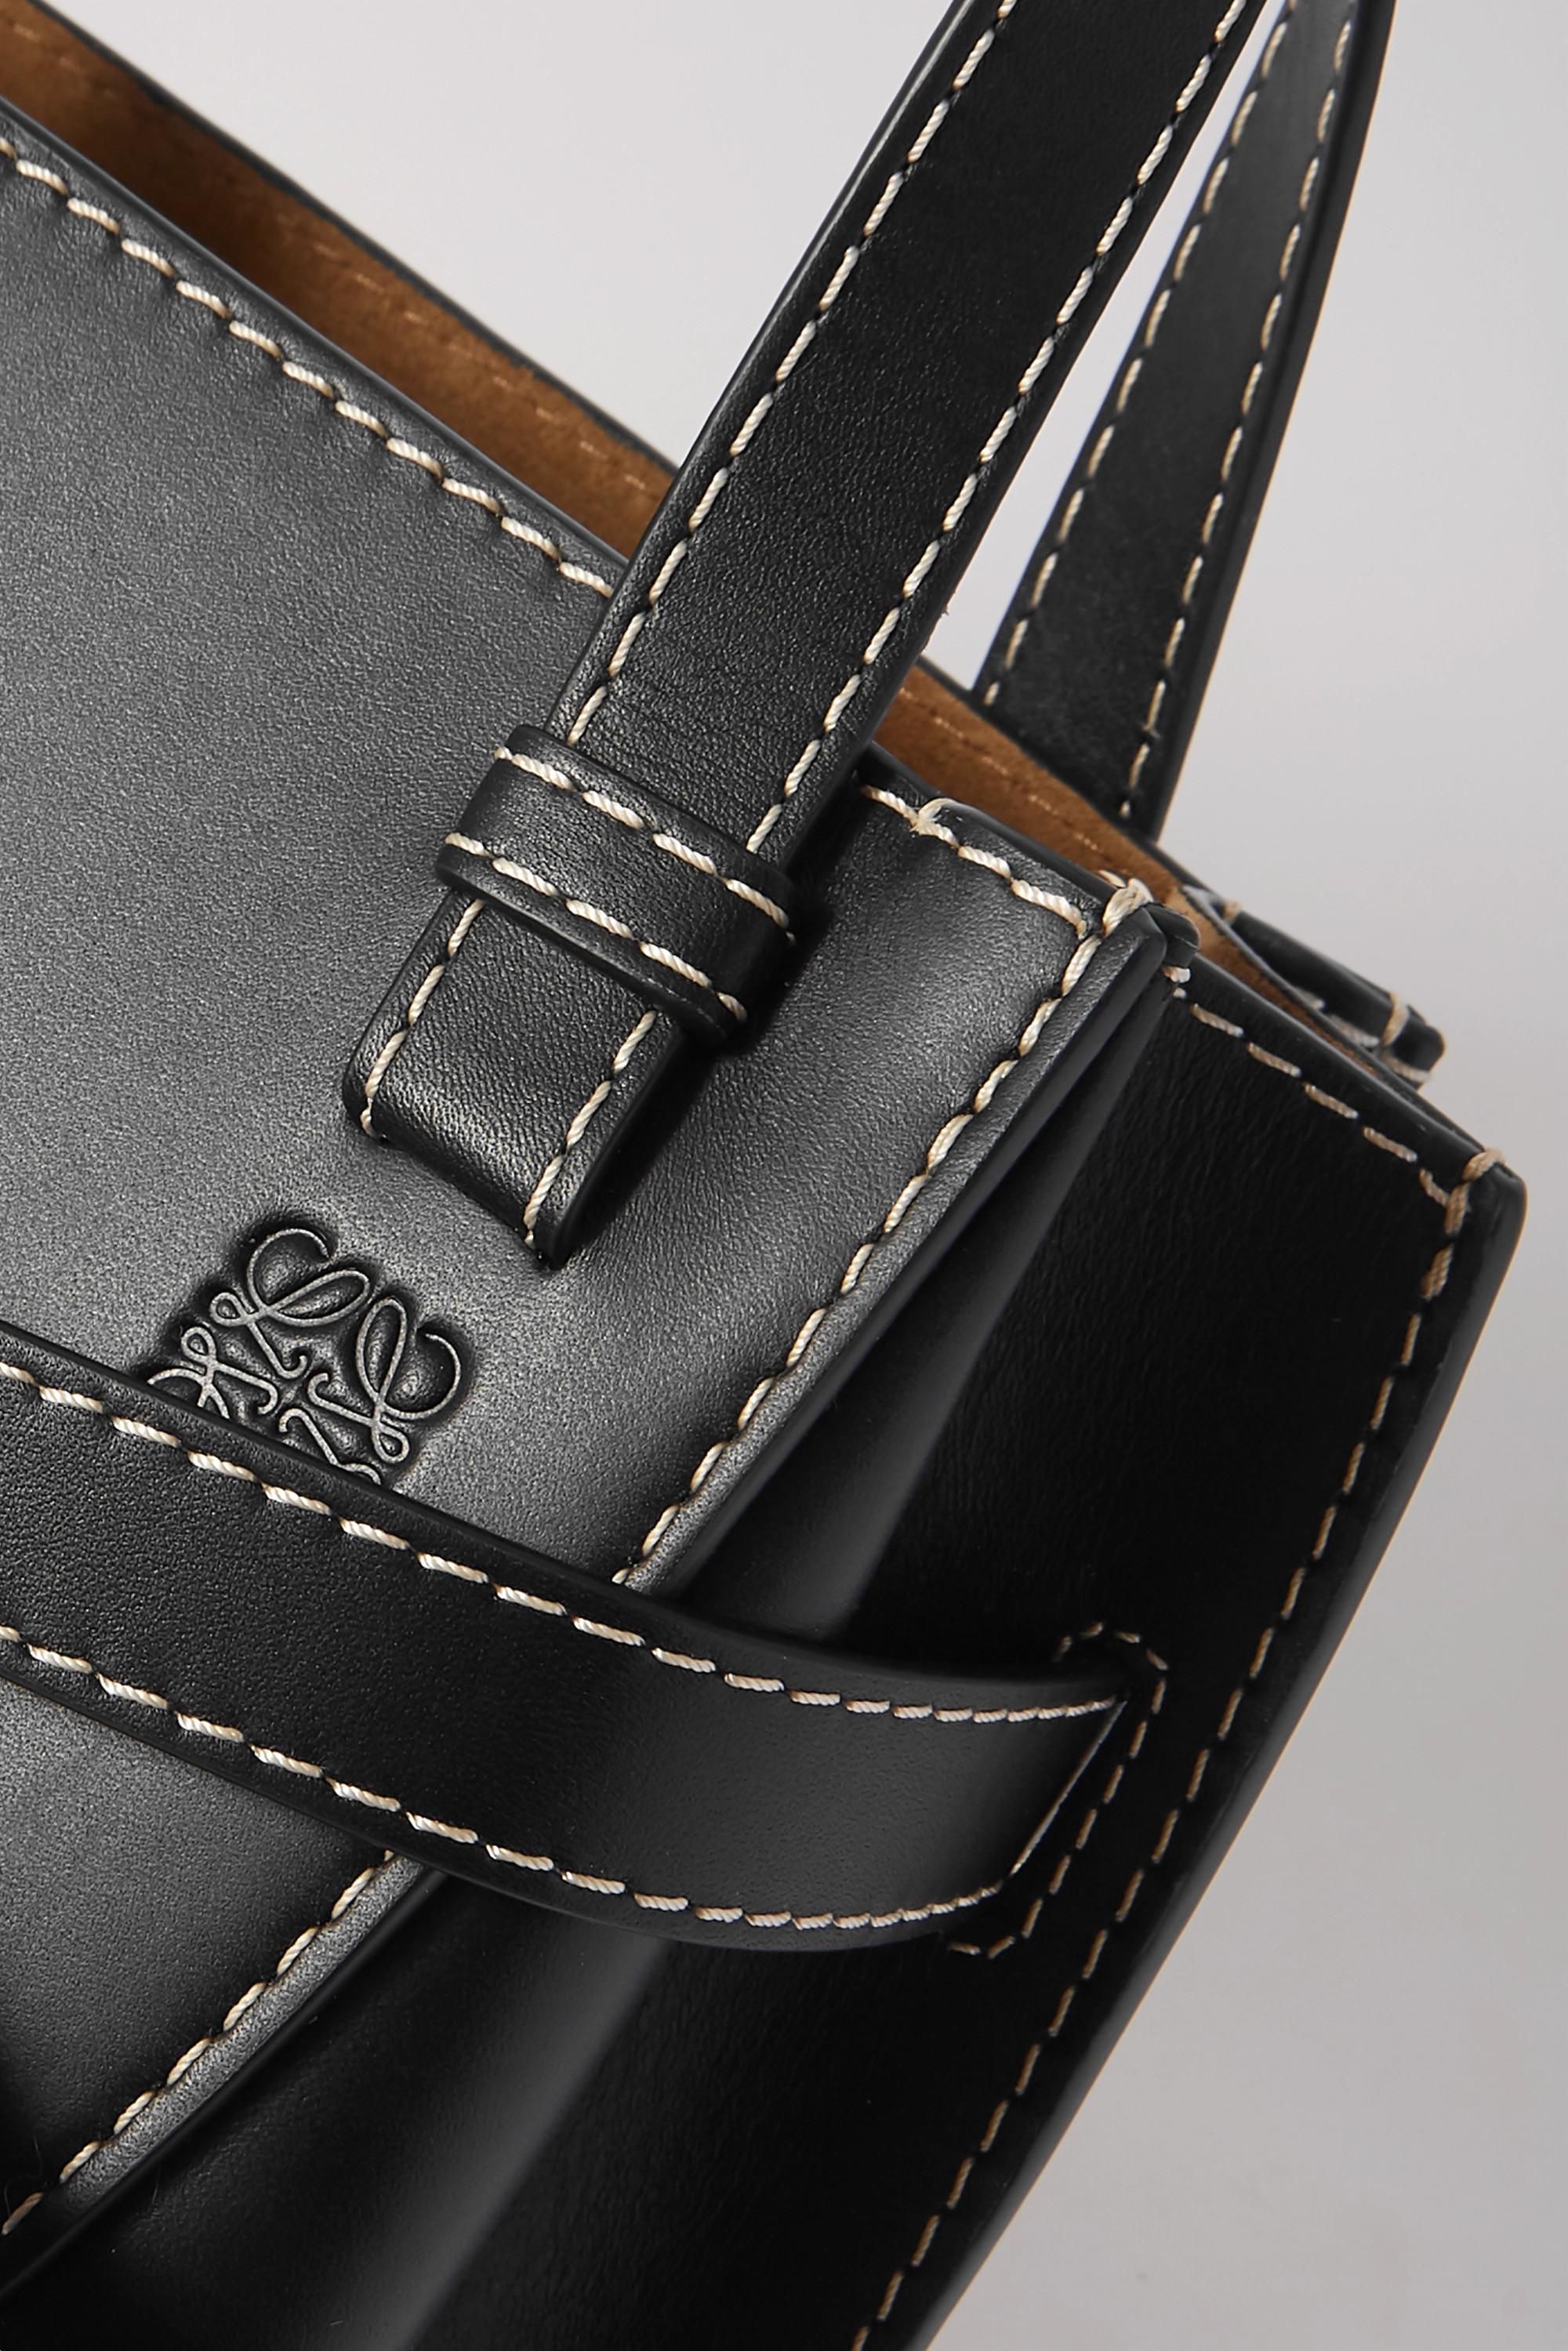 Loewe Gate mini topstiched leather tote